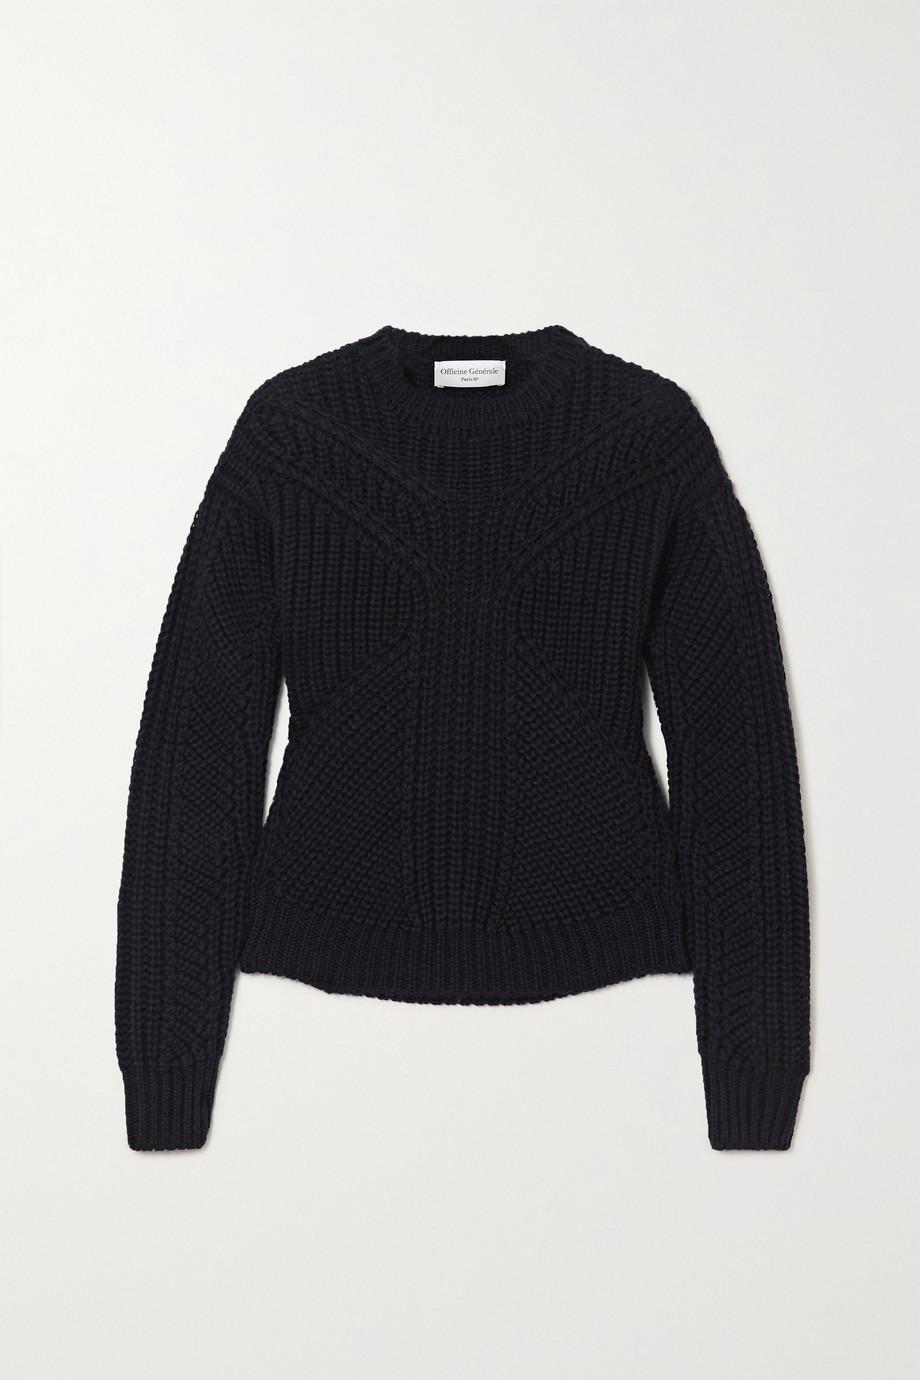 Officine Générale Anita ribbed wool sweater